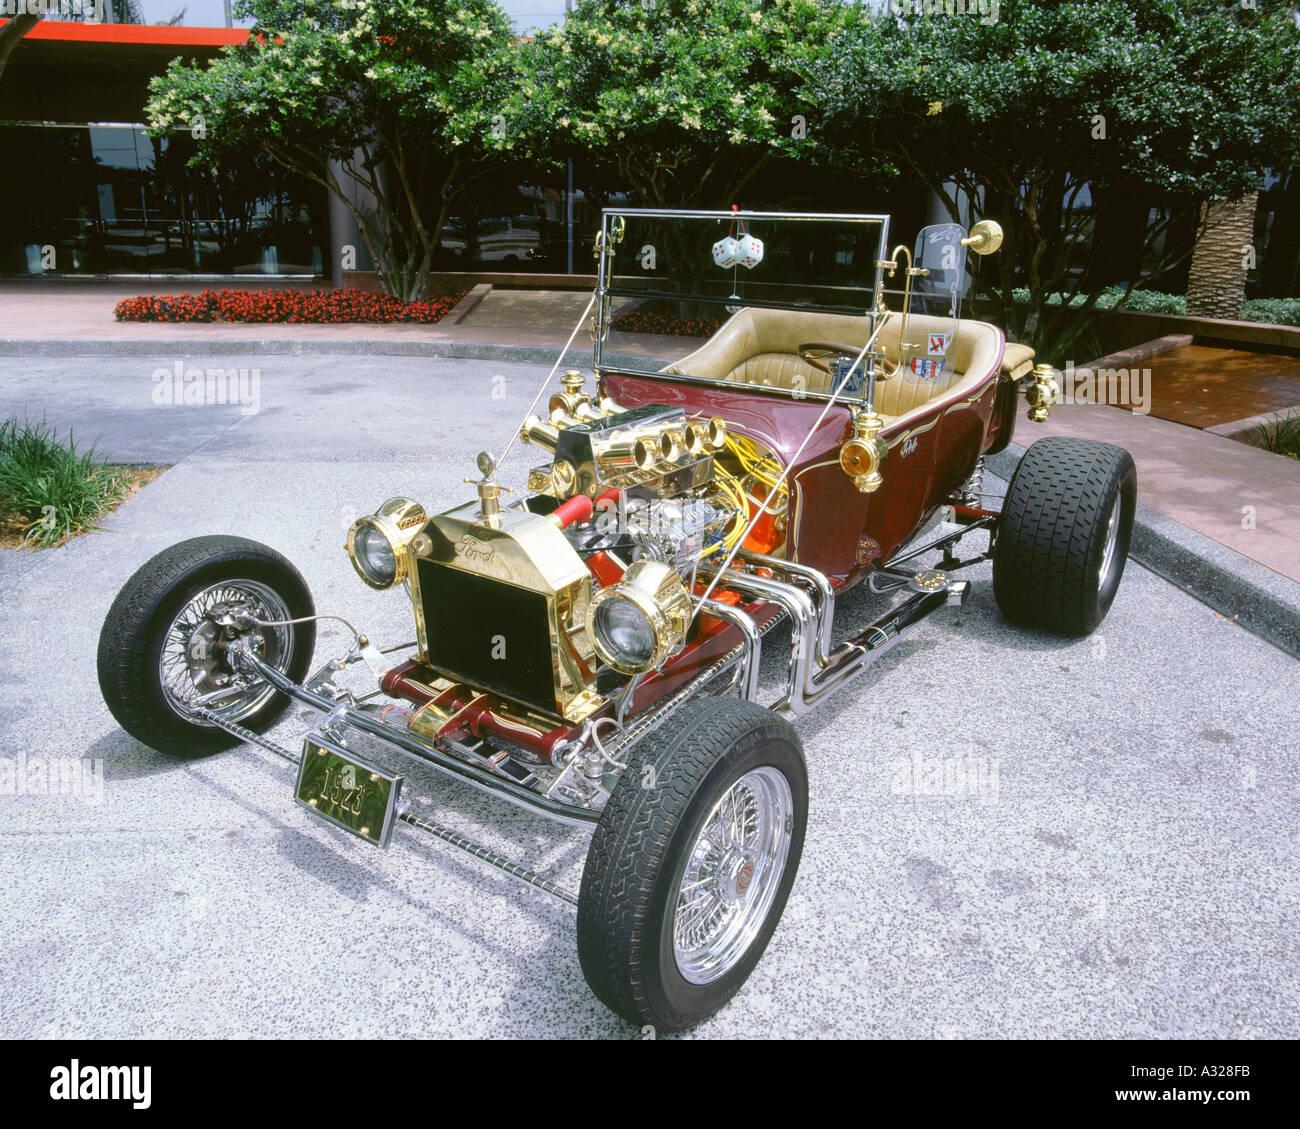 Model T Hot Rod Stock Photos & Model T Hot Rod Stock Images - Alamy